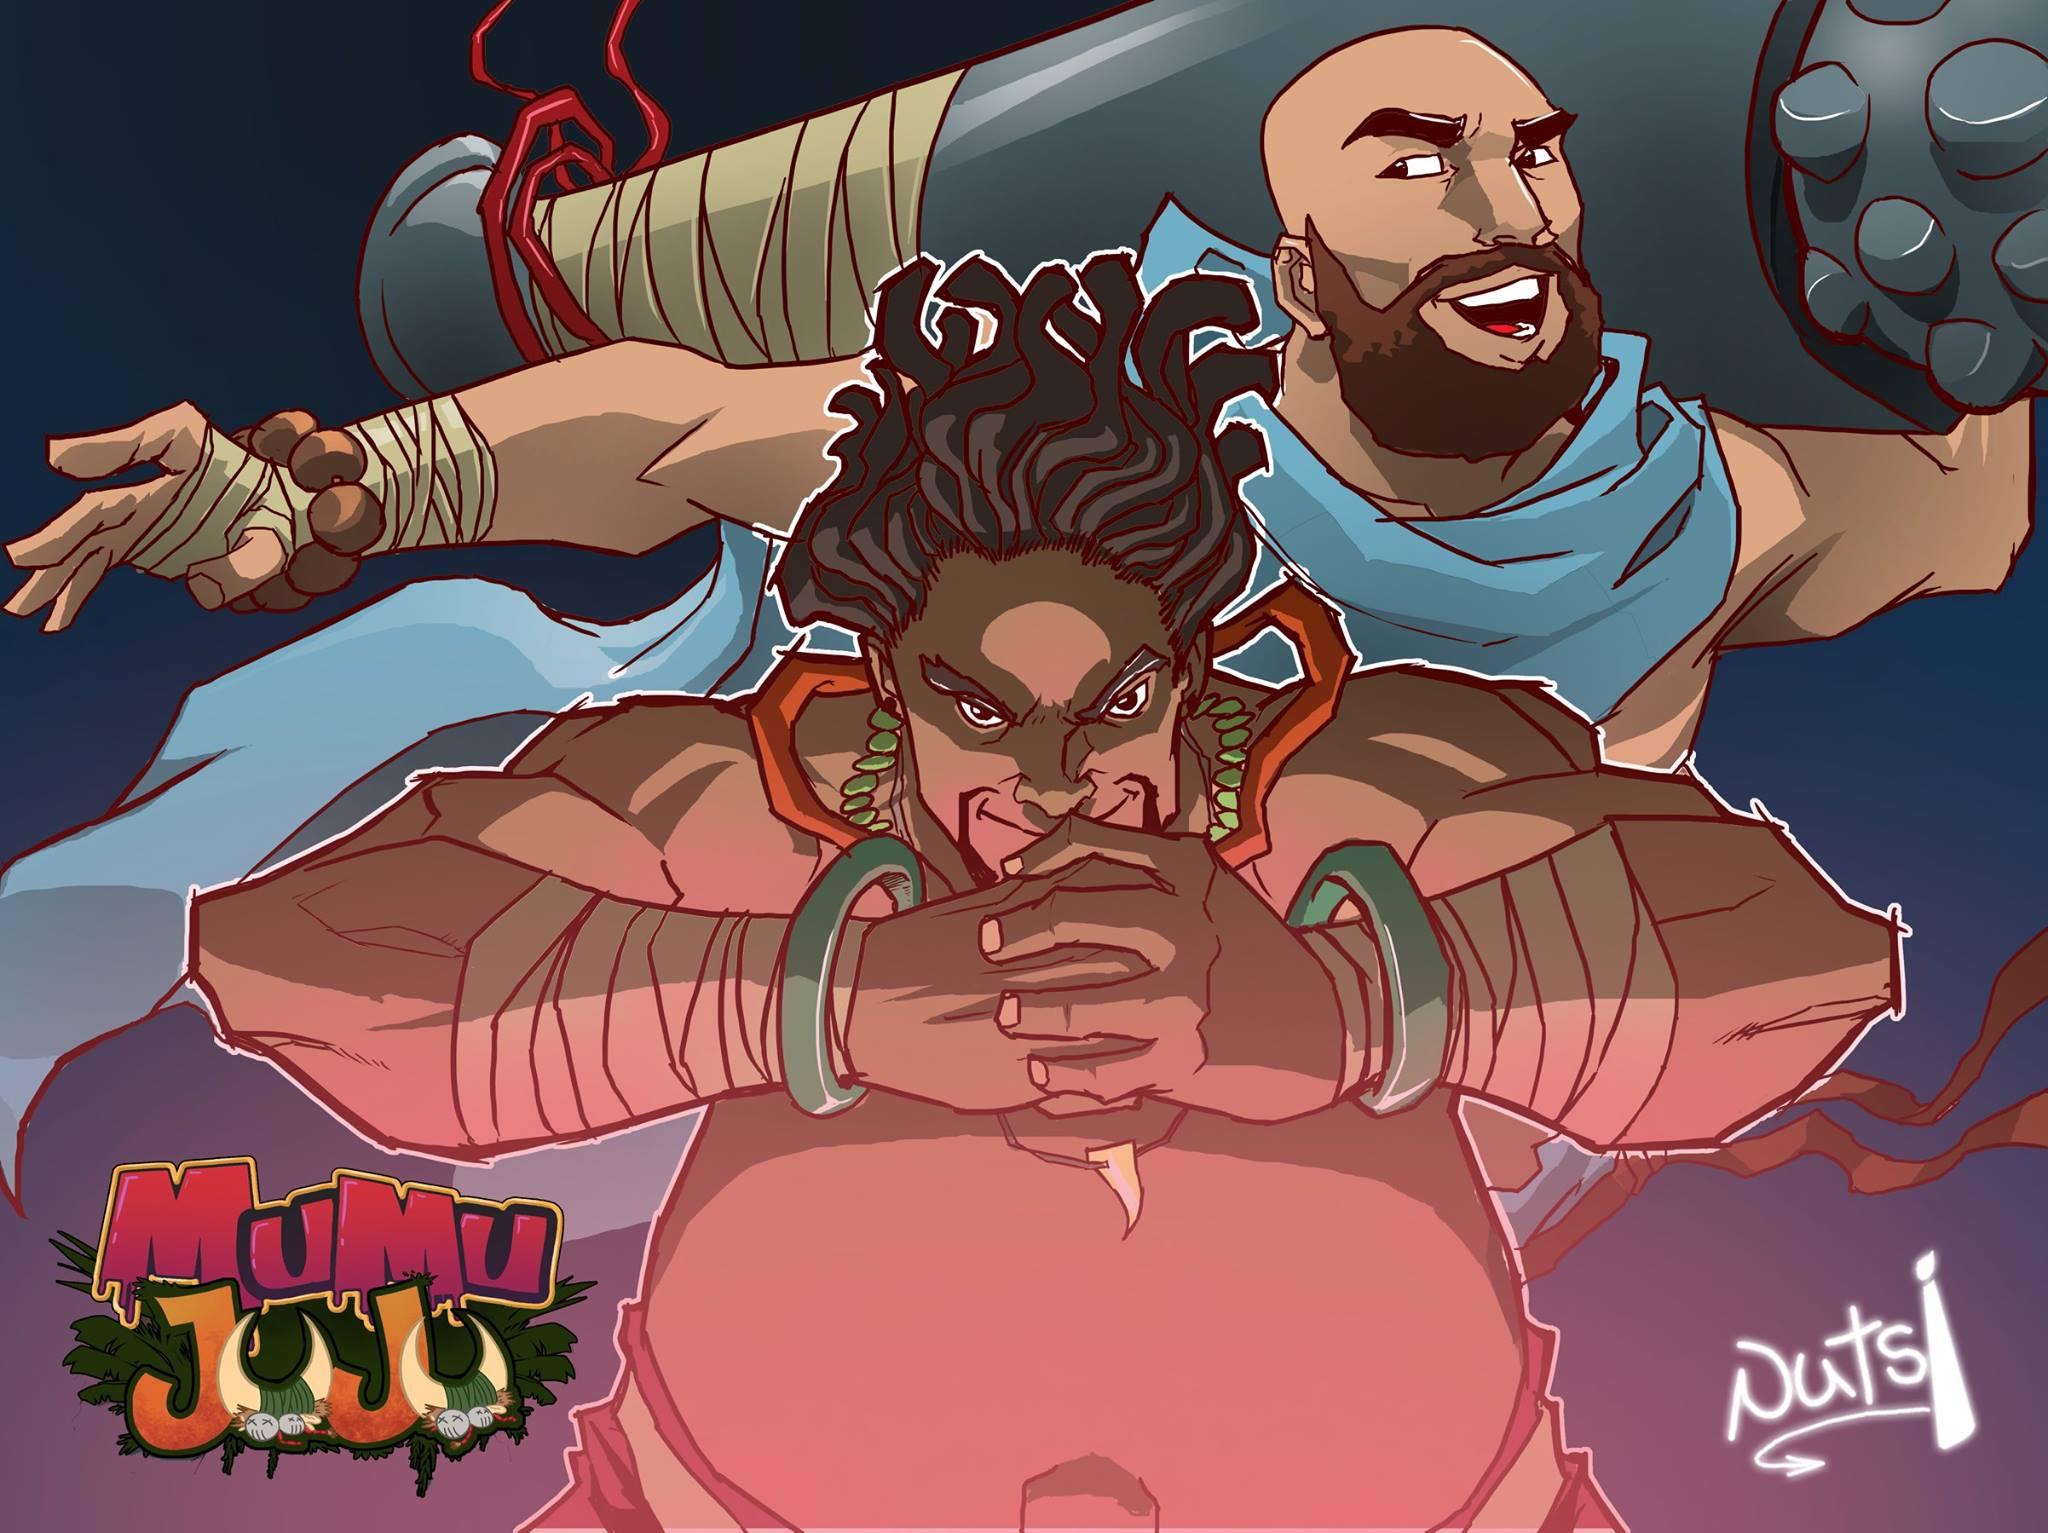 Mumu Juju main characters, Mortar and the Pestle